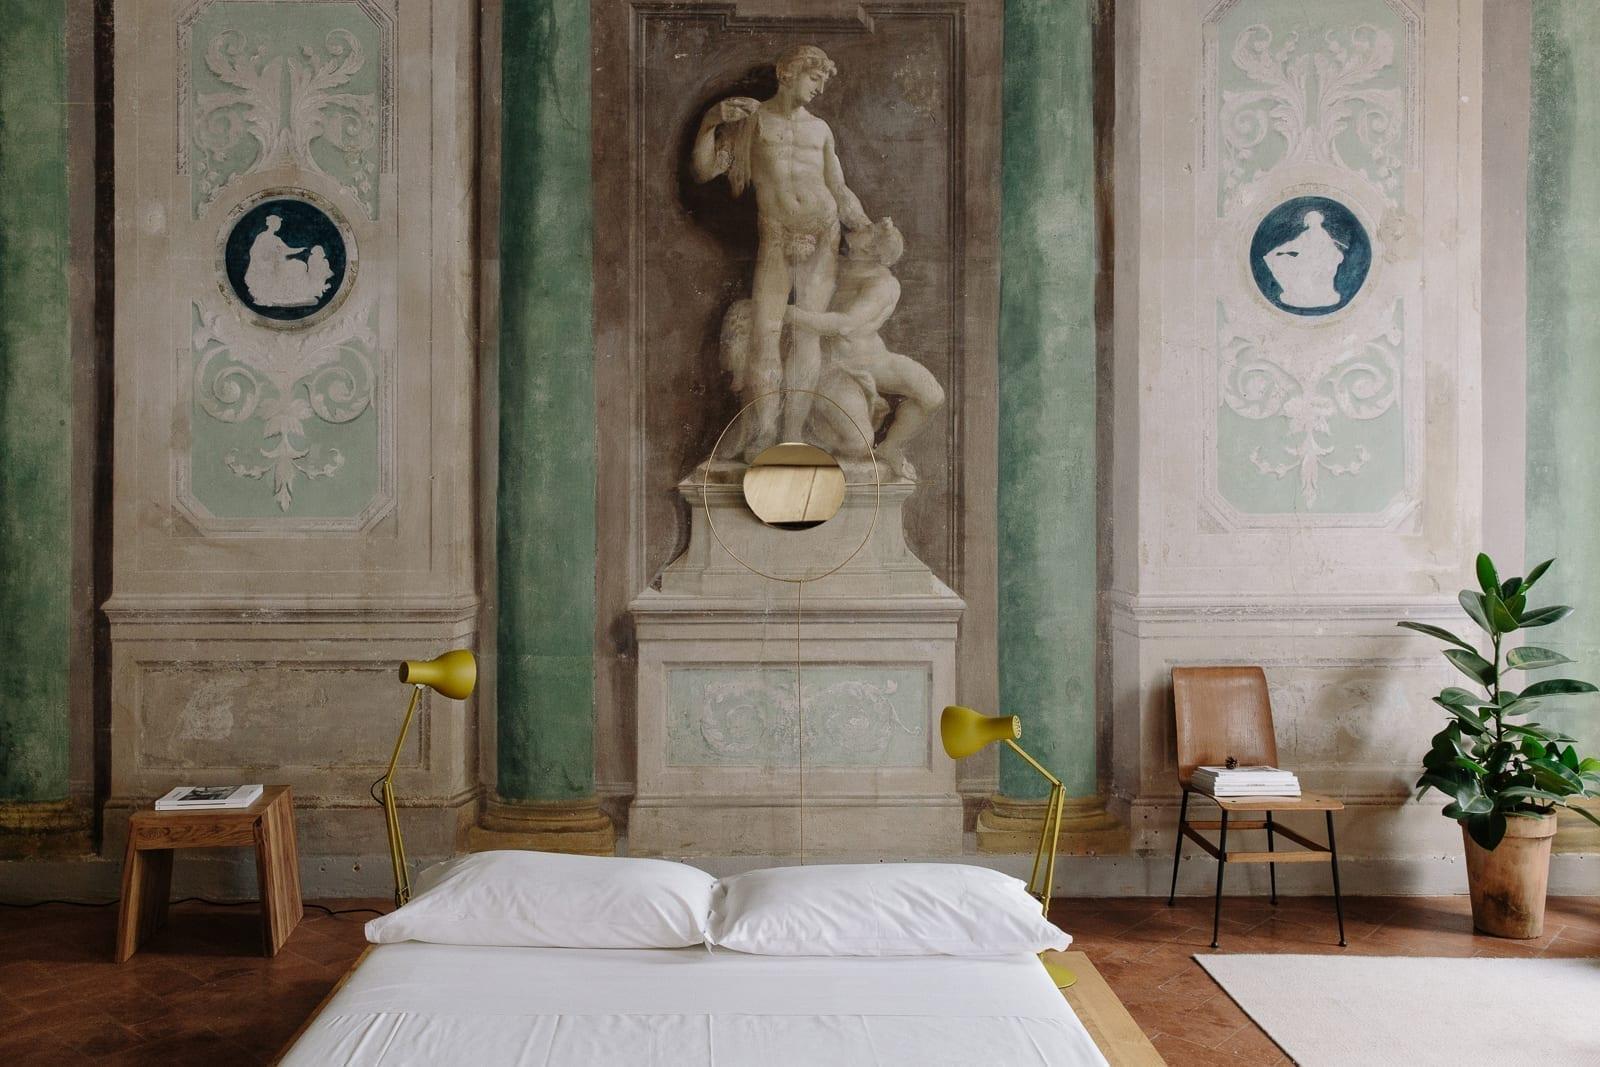 Nest Italy - Design Residency in Florence